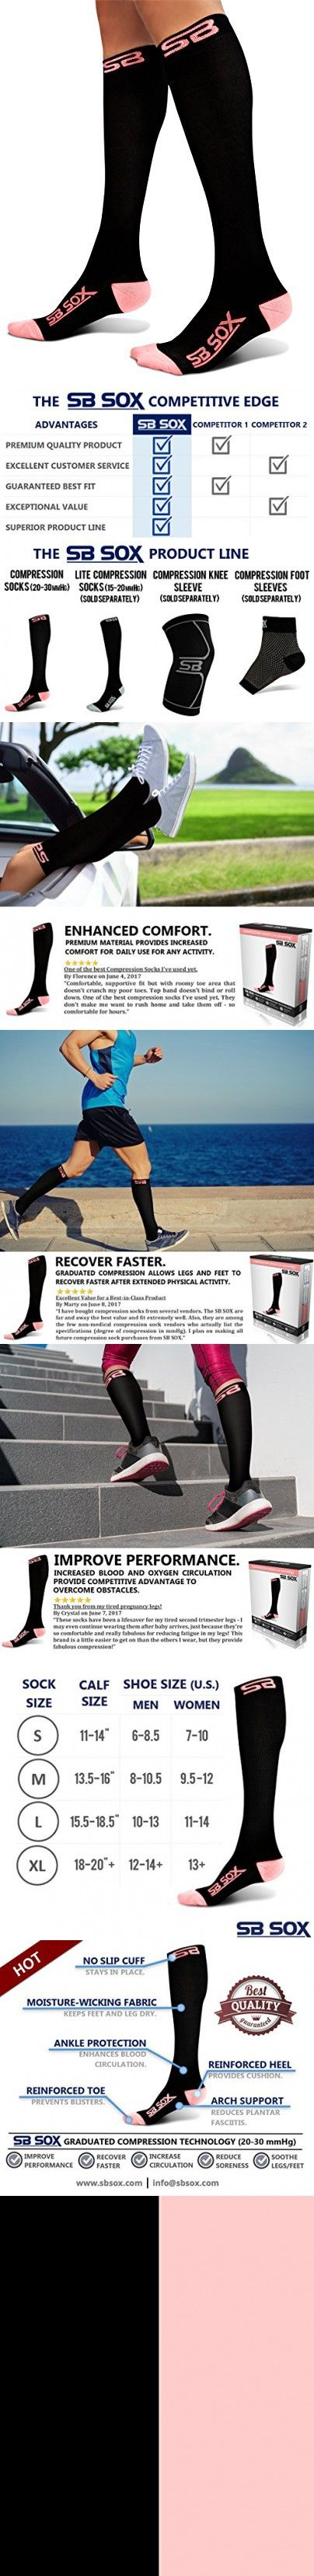 SB SOX Compression Socks (20-30mmHg) for Men & Women - BEST Socks for Running, Medical, Athletic, Varicose Veins, Travel, Pregnancy, Shin Splints, Nursing. (Black/Pink, Medium)